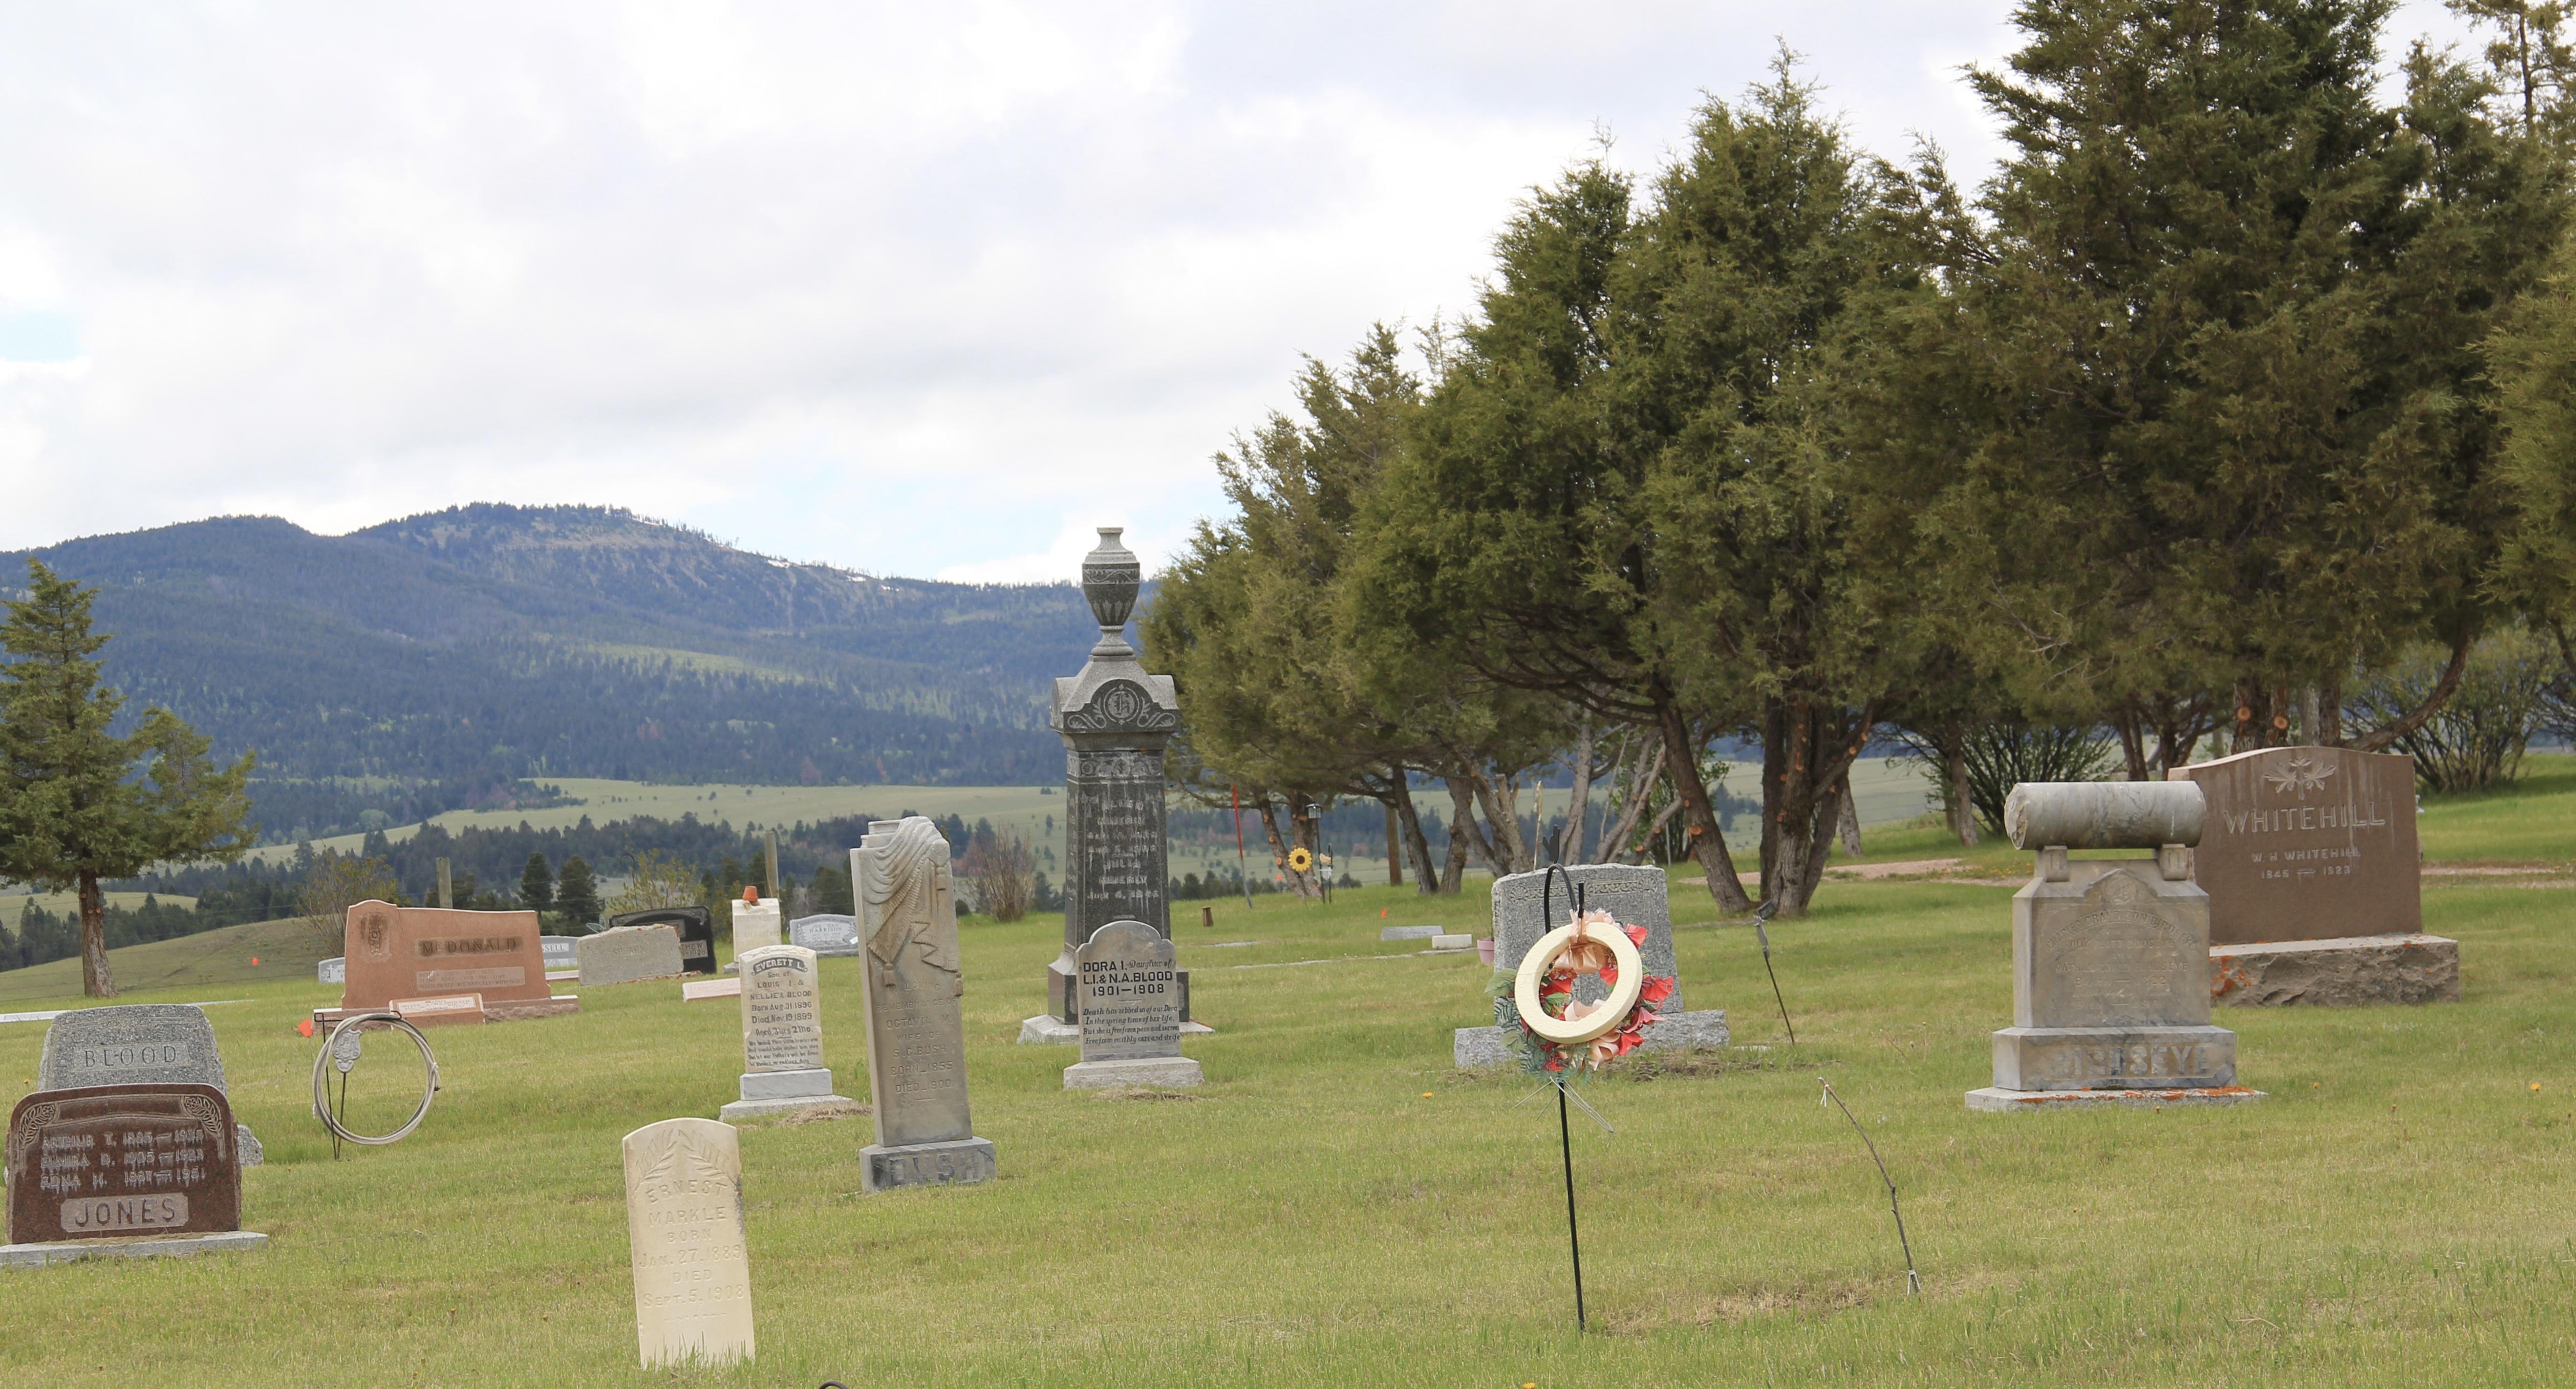 Avon Cemetery, W, Powell Co